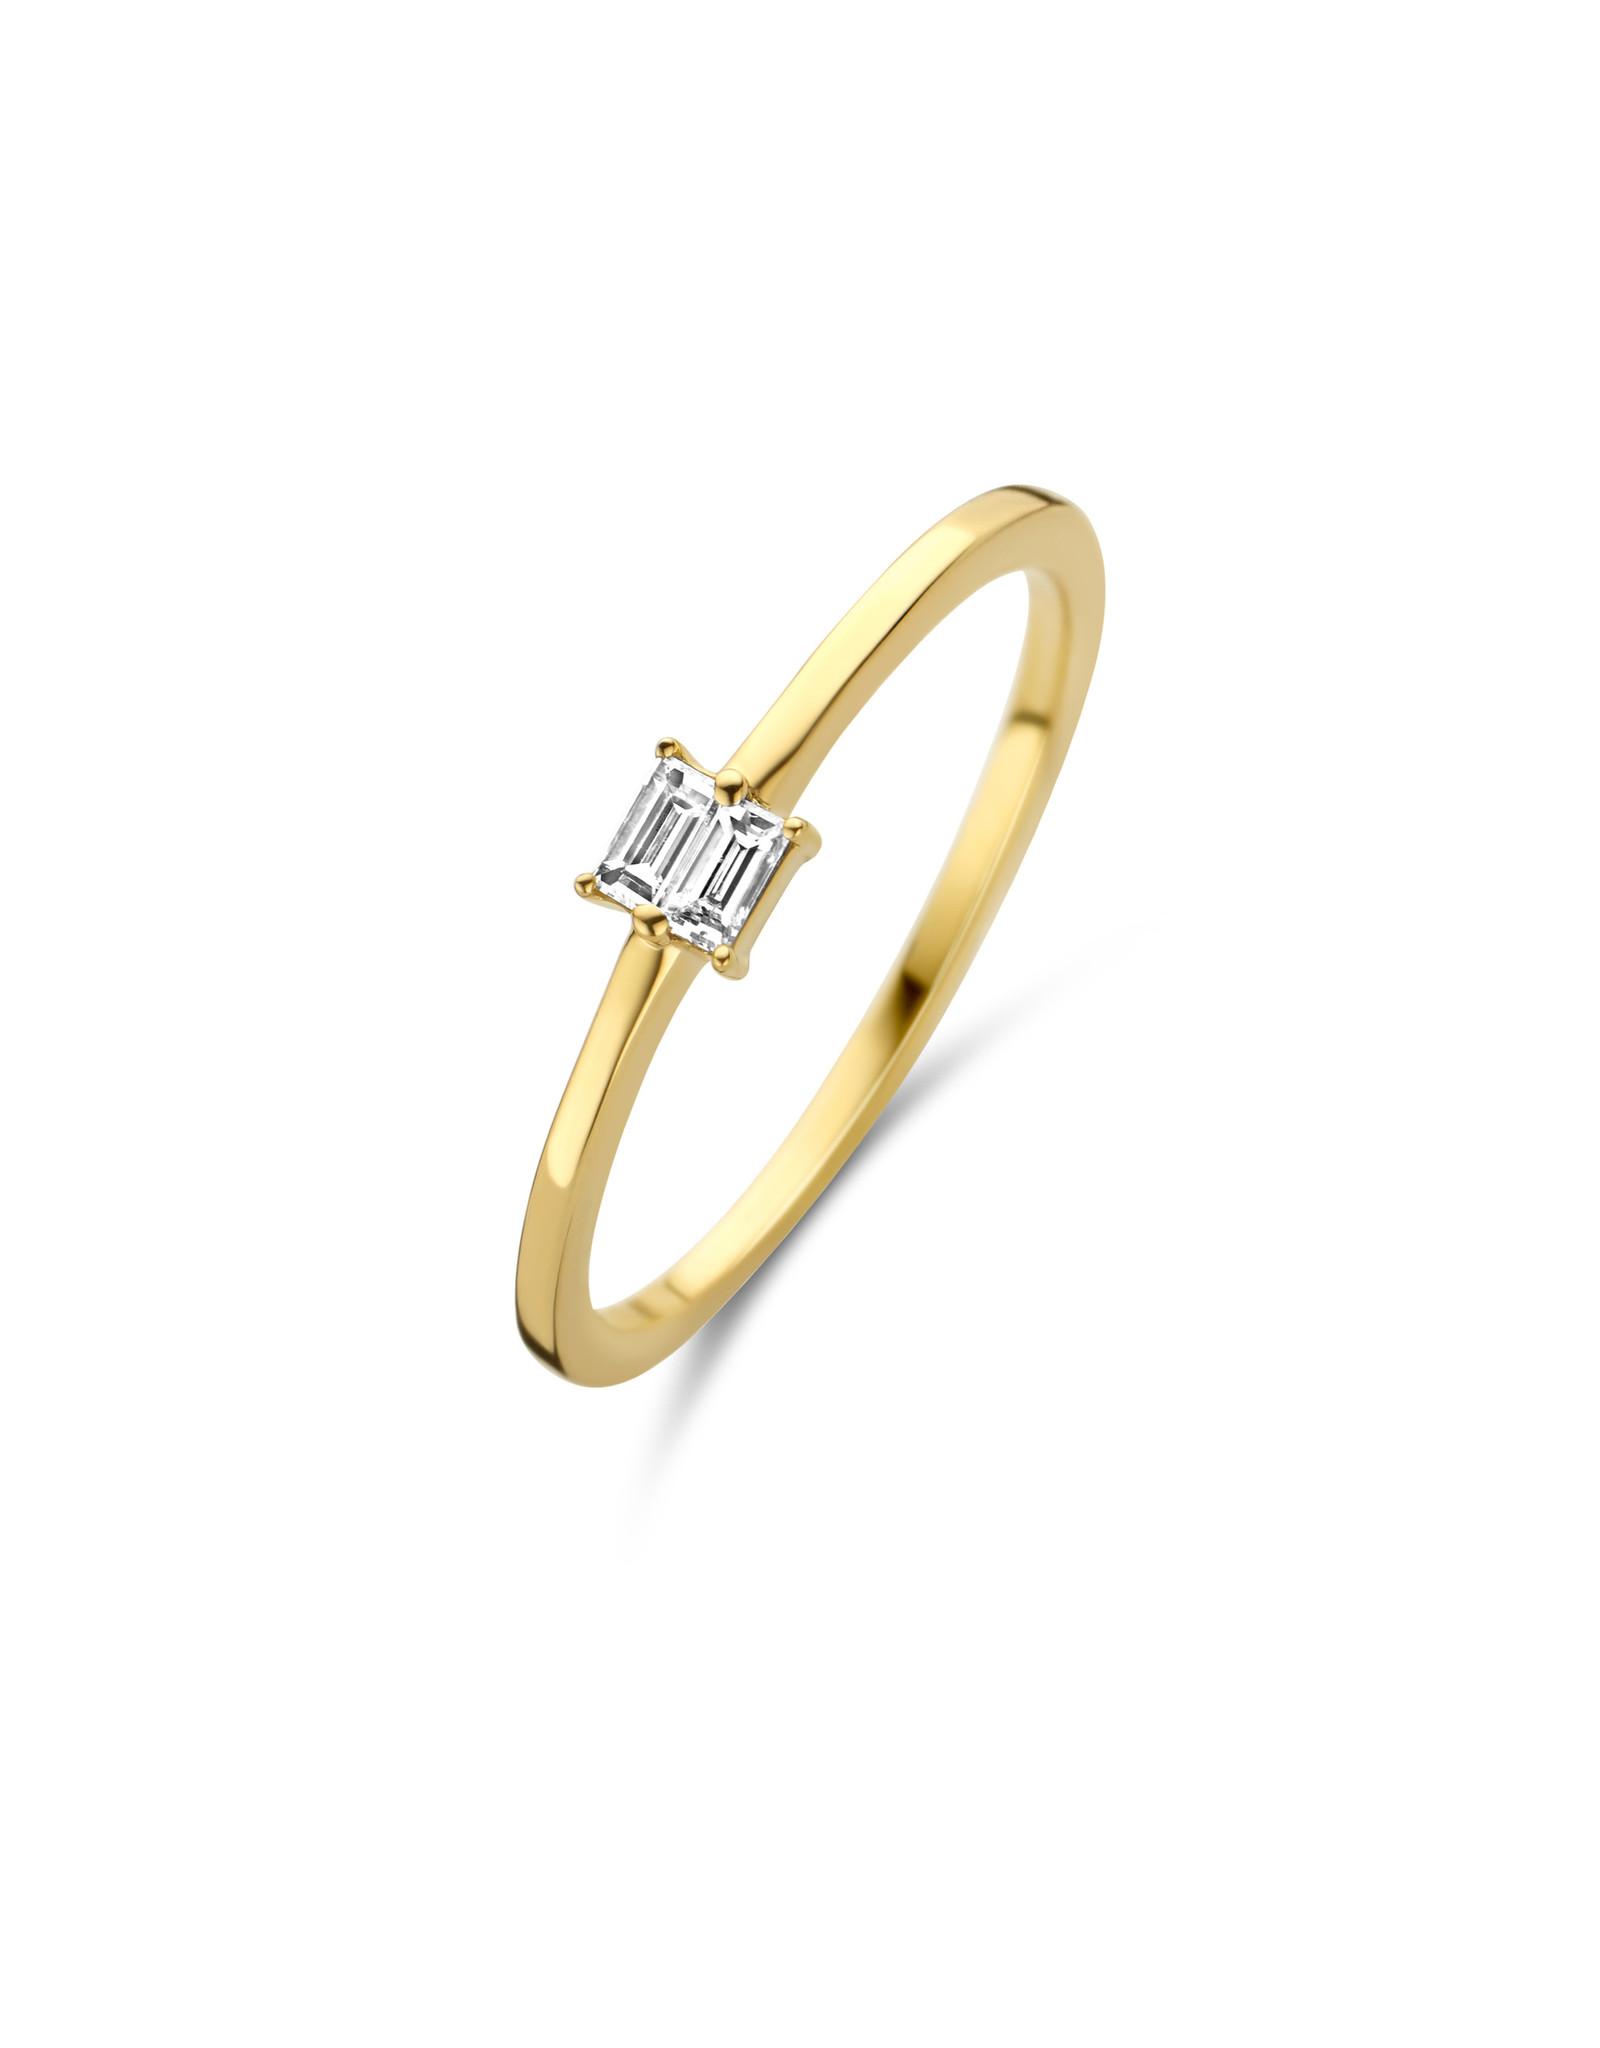 Ring Geel Goud 18kt 062943/A